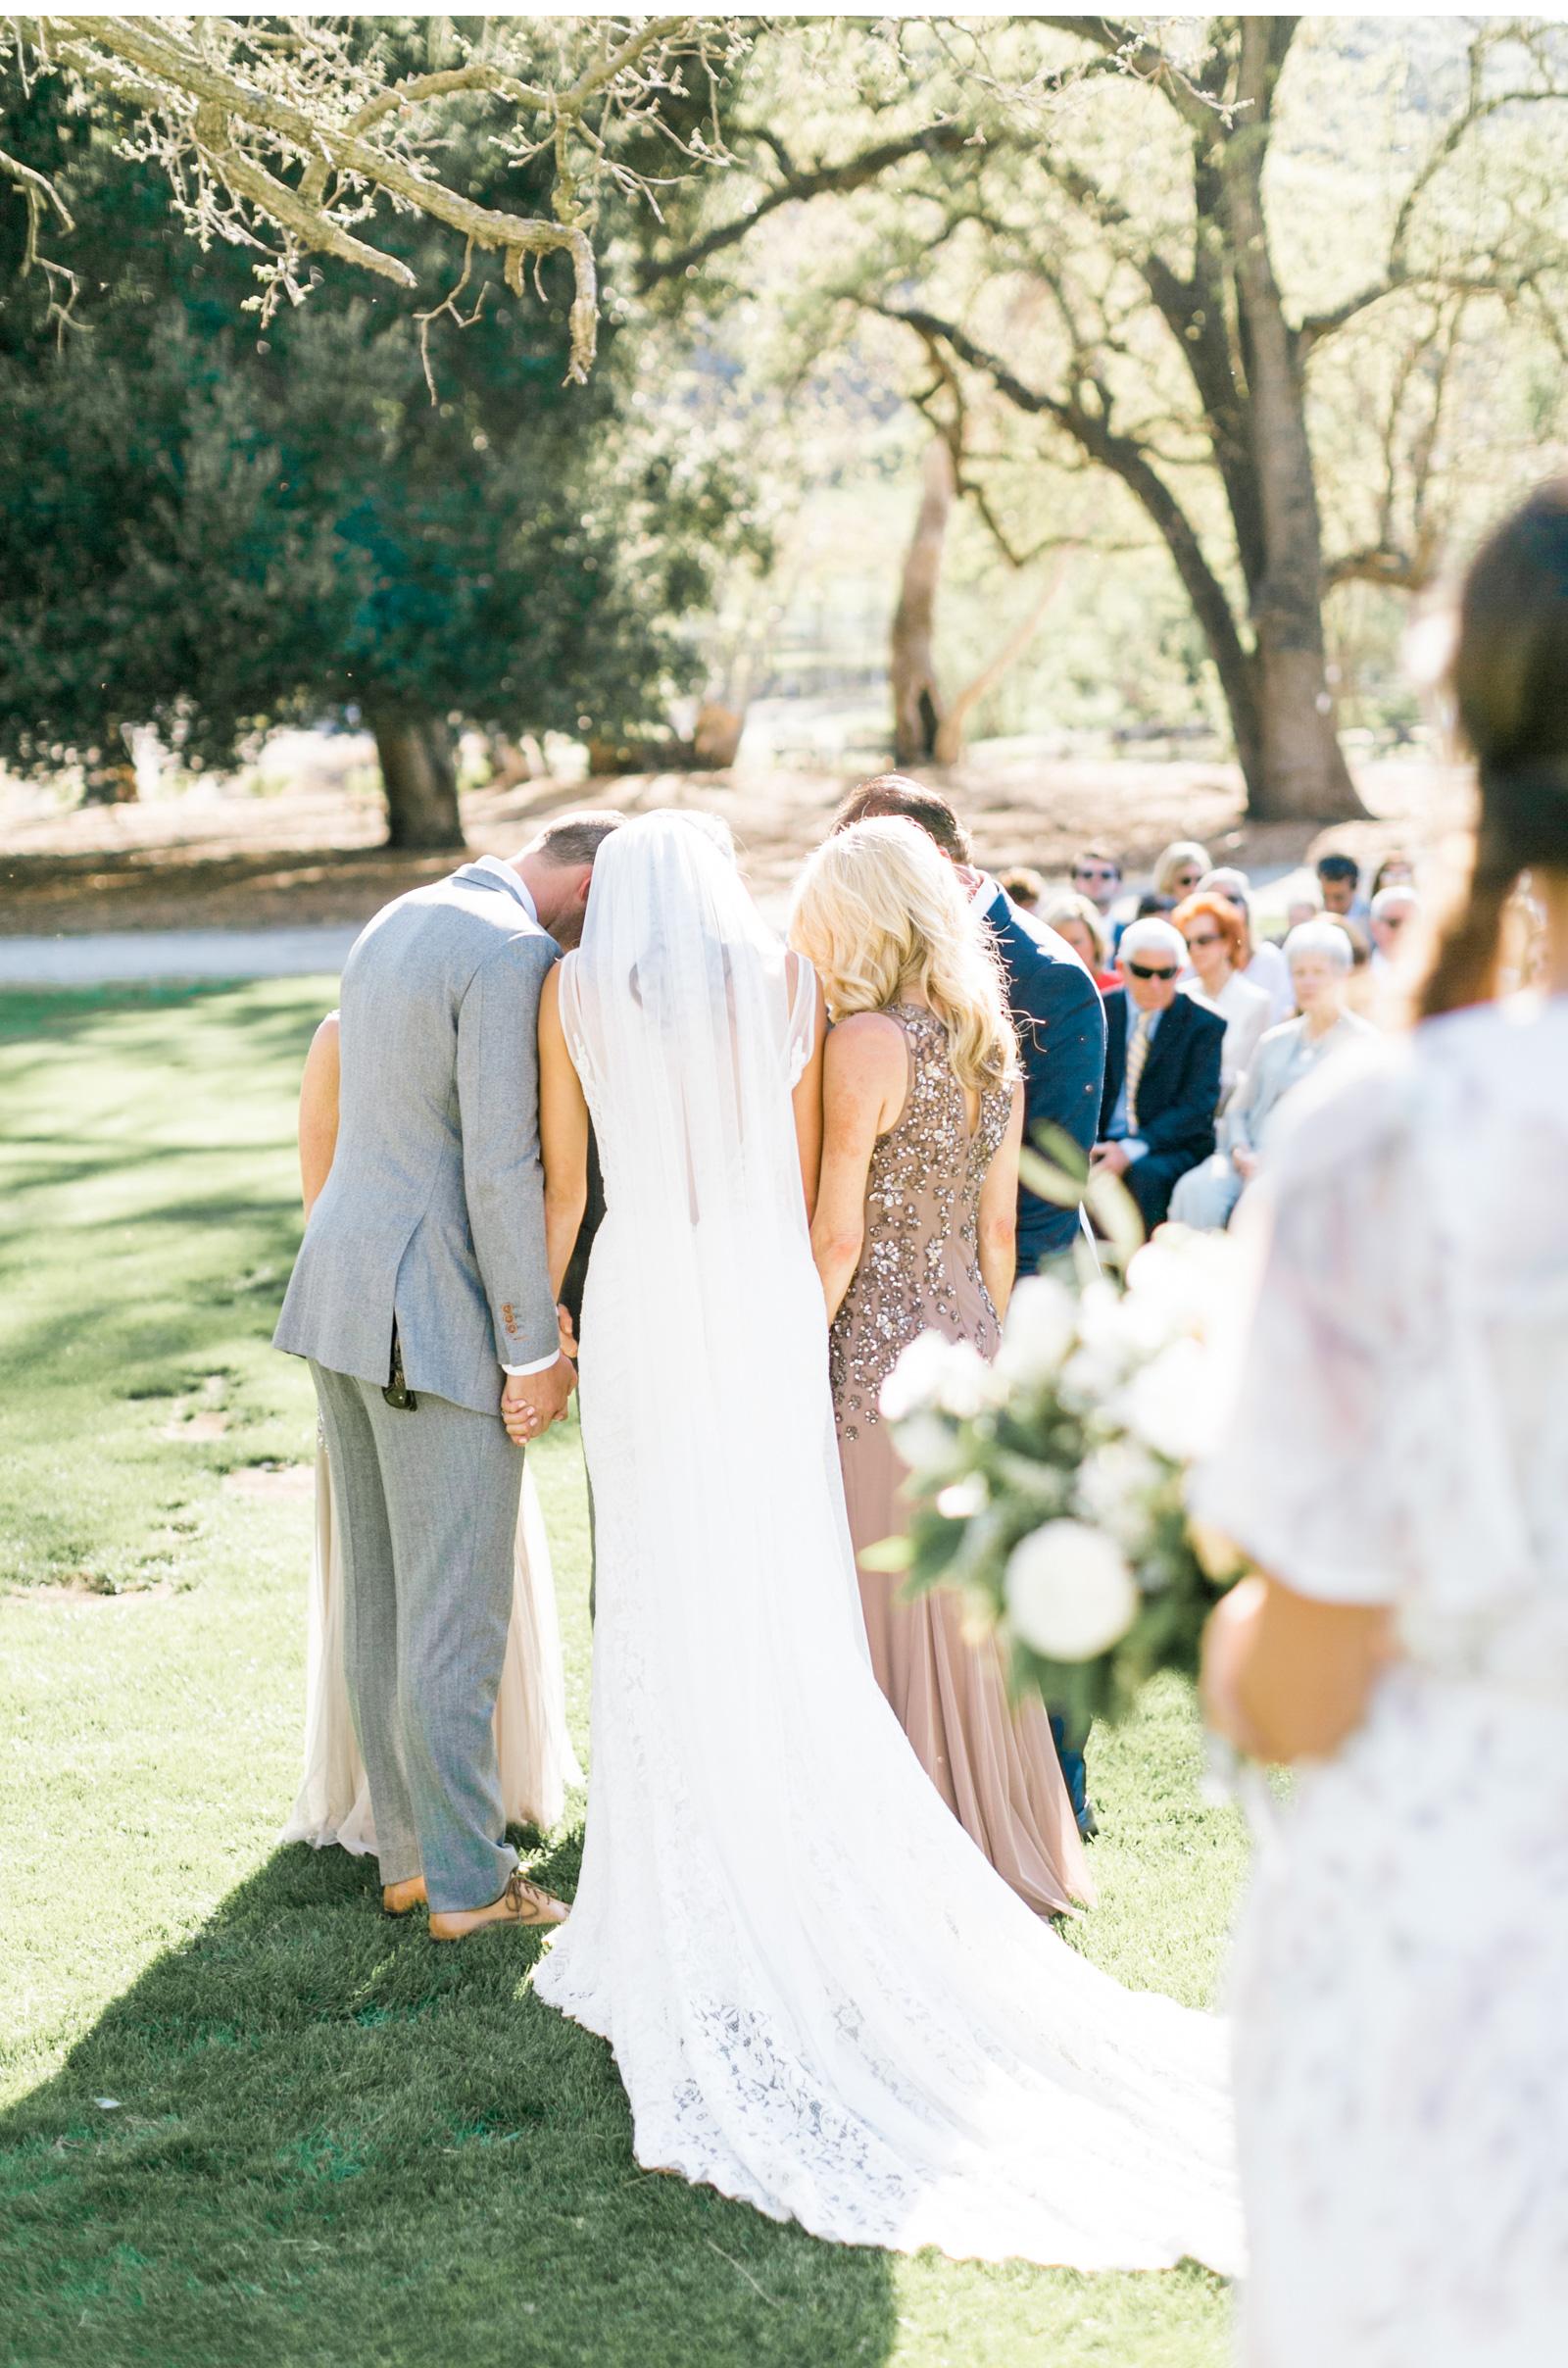 Malibu-Wedding-Photographer-Triunfo-Creek-Natalie-Schutt-Photography_11.jpg